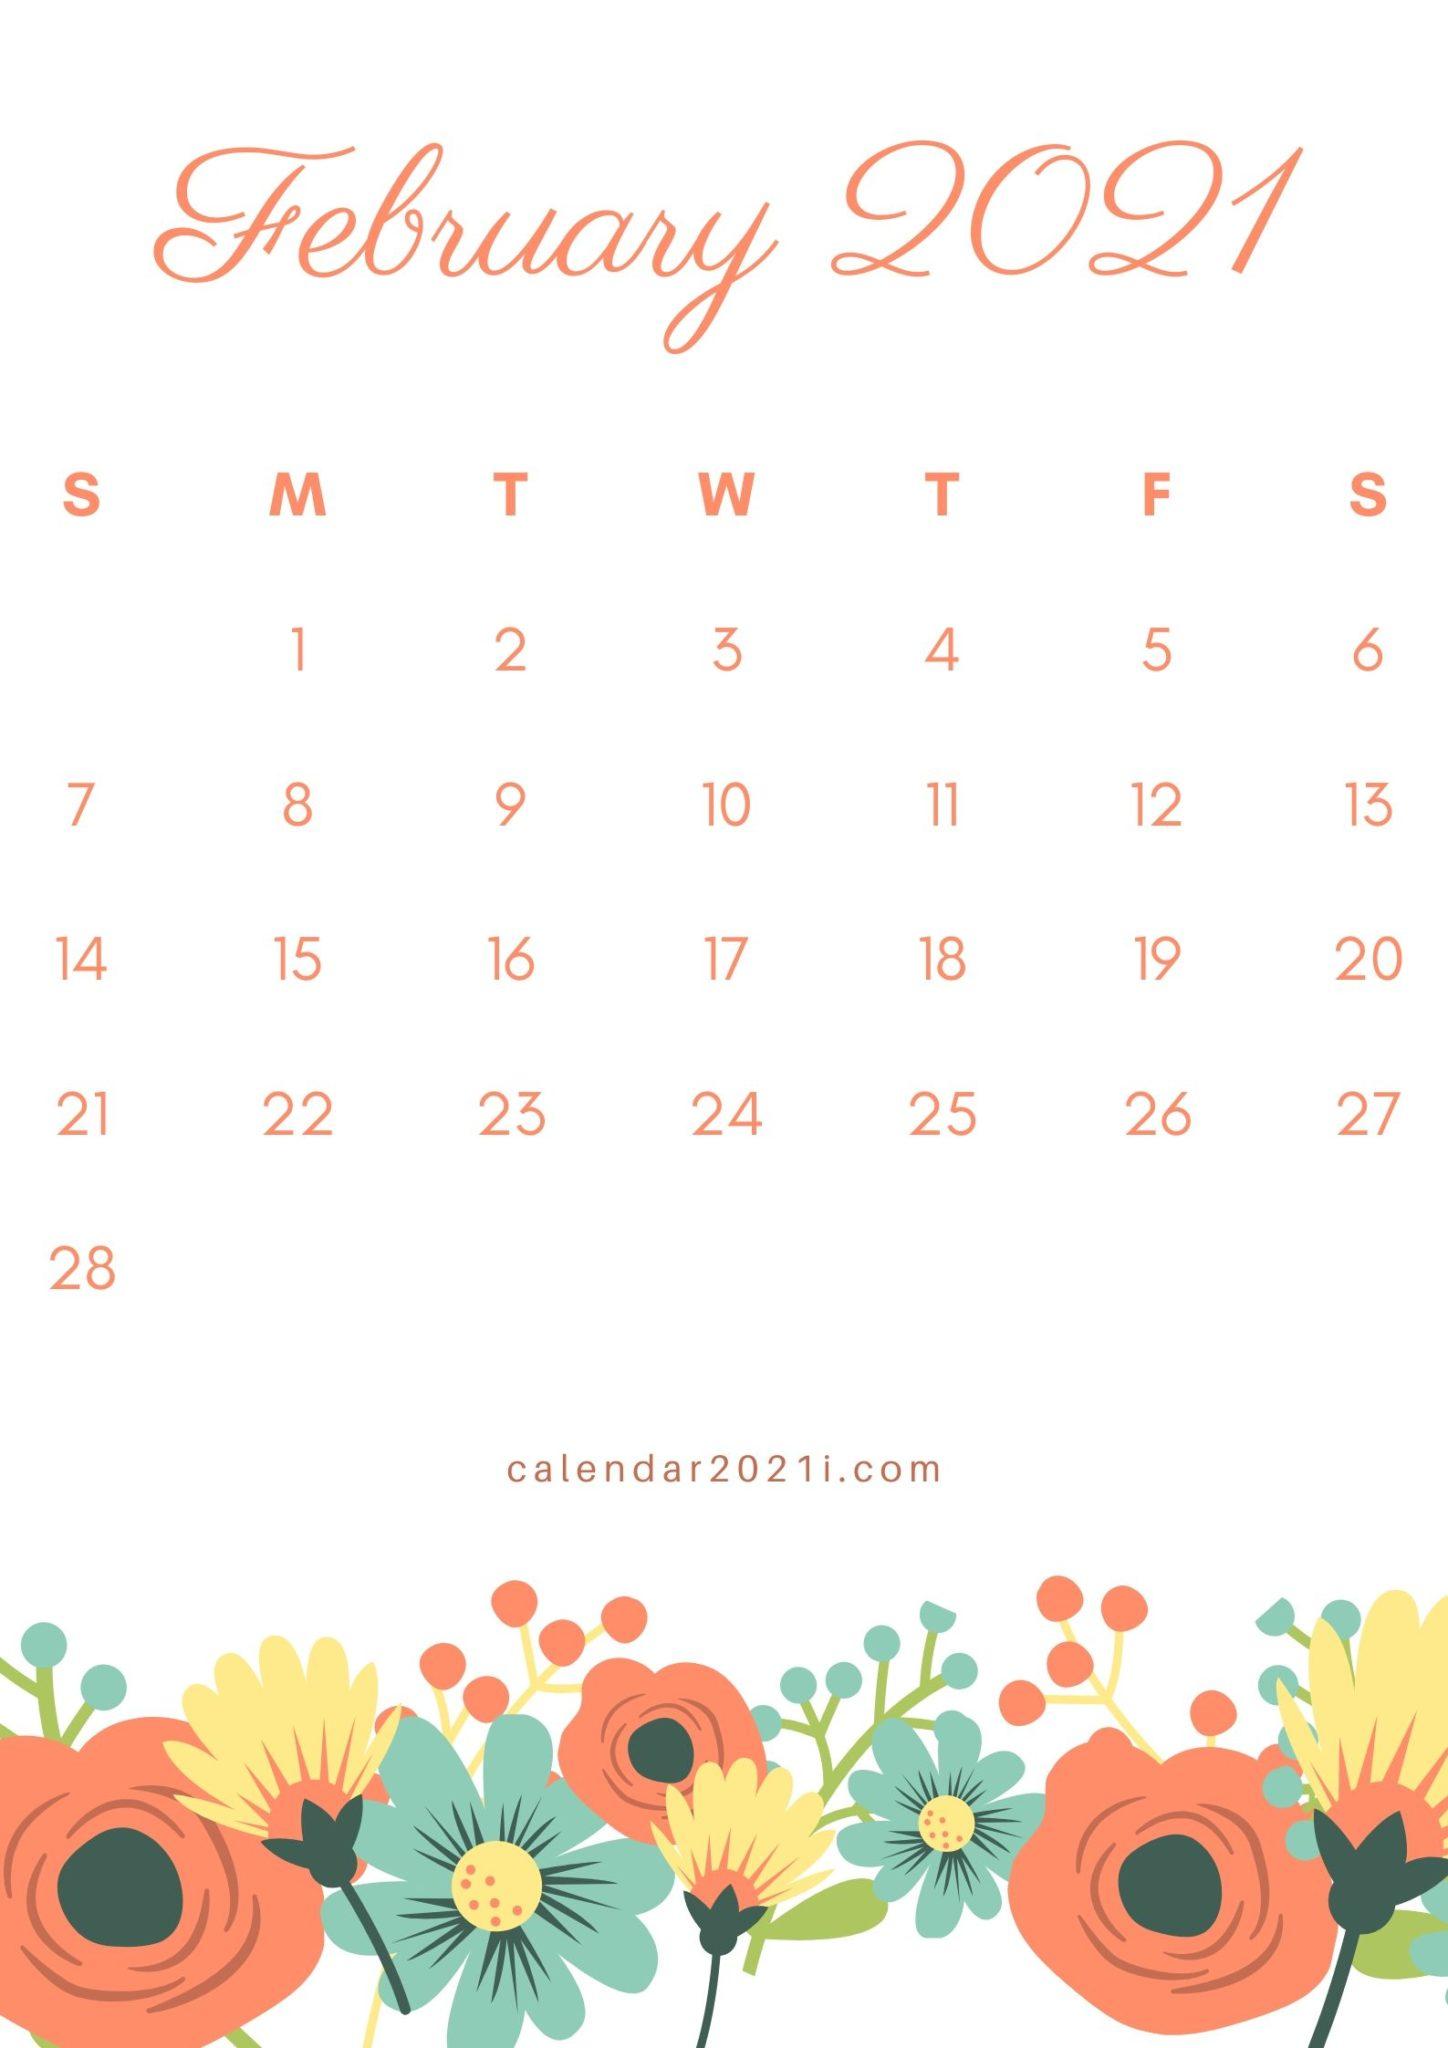 Free Floral February 2021 Calendar Printable